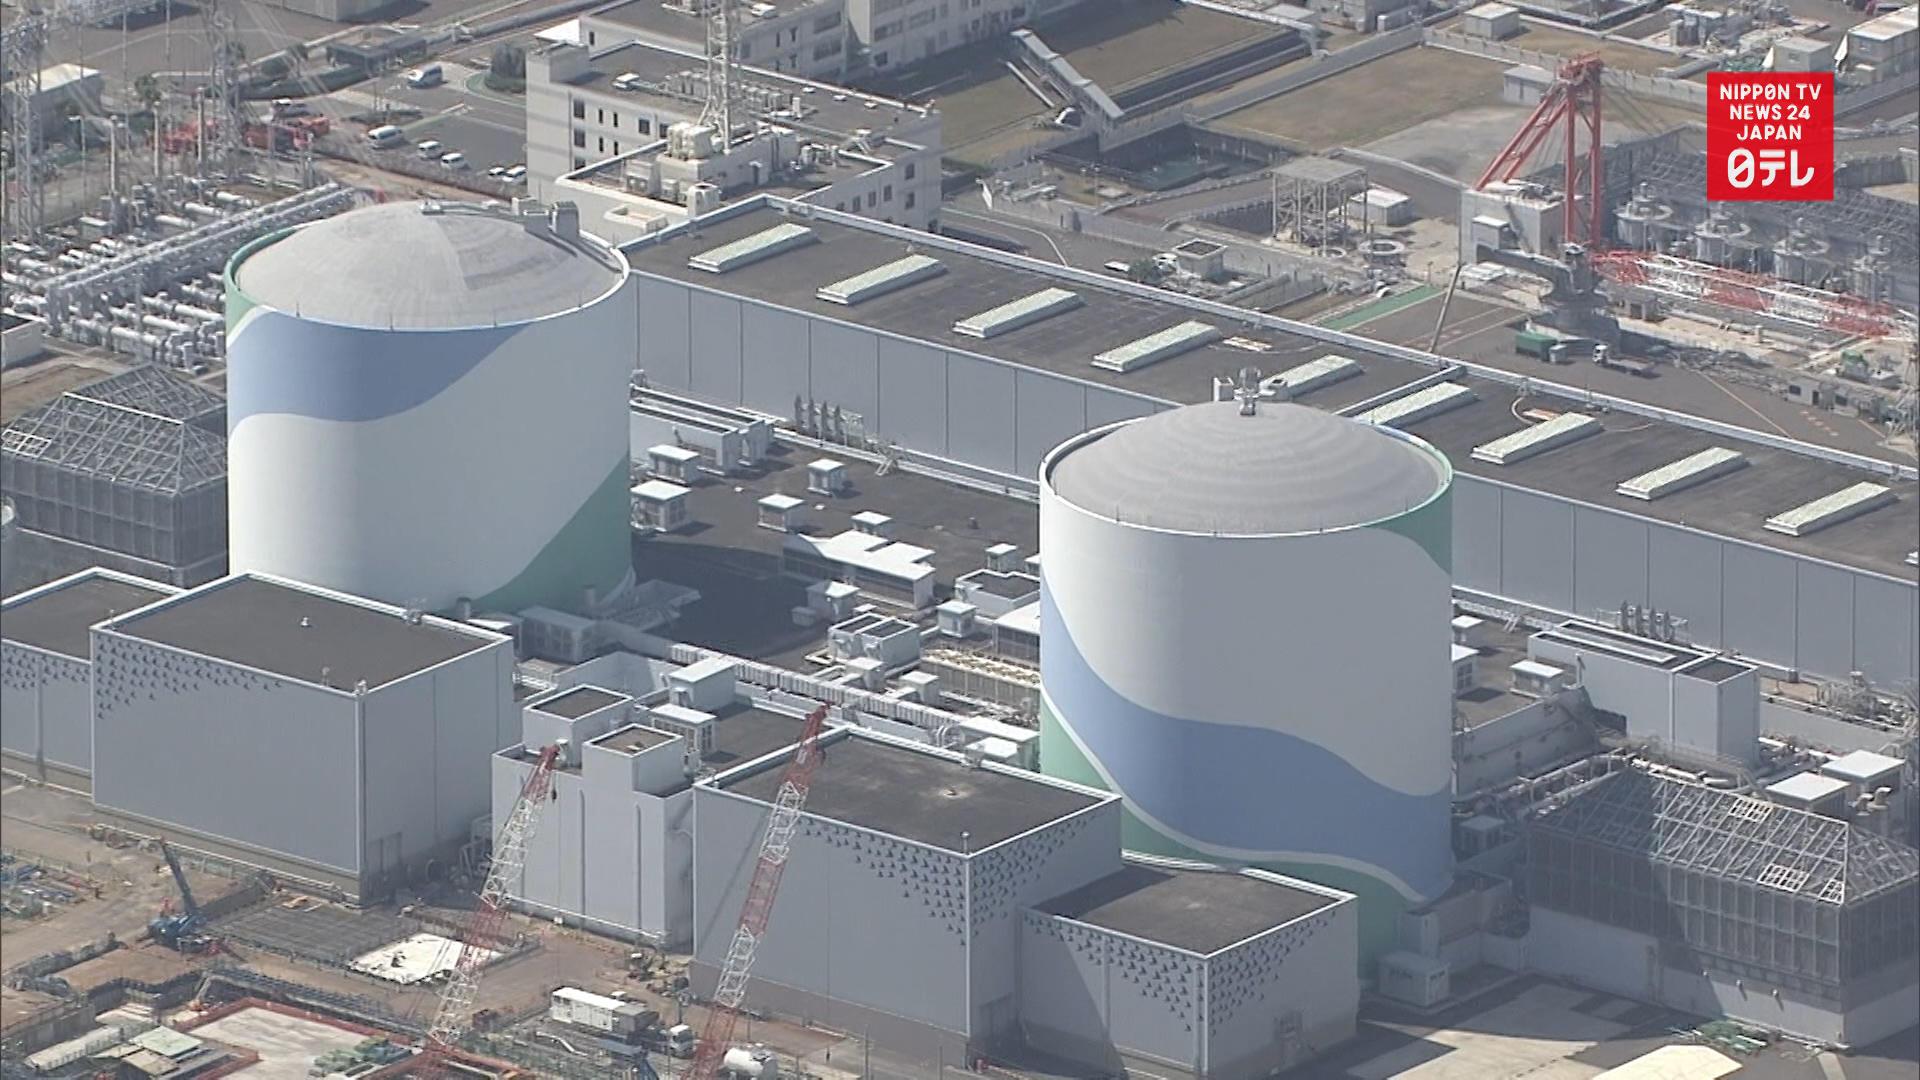 Nuclear reactor in southwestern Japan goes offline over tardy anti-terror measures